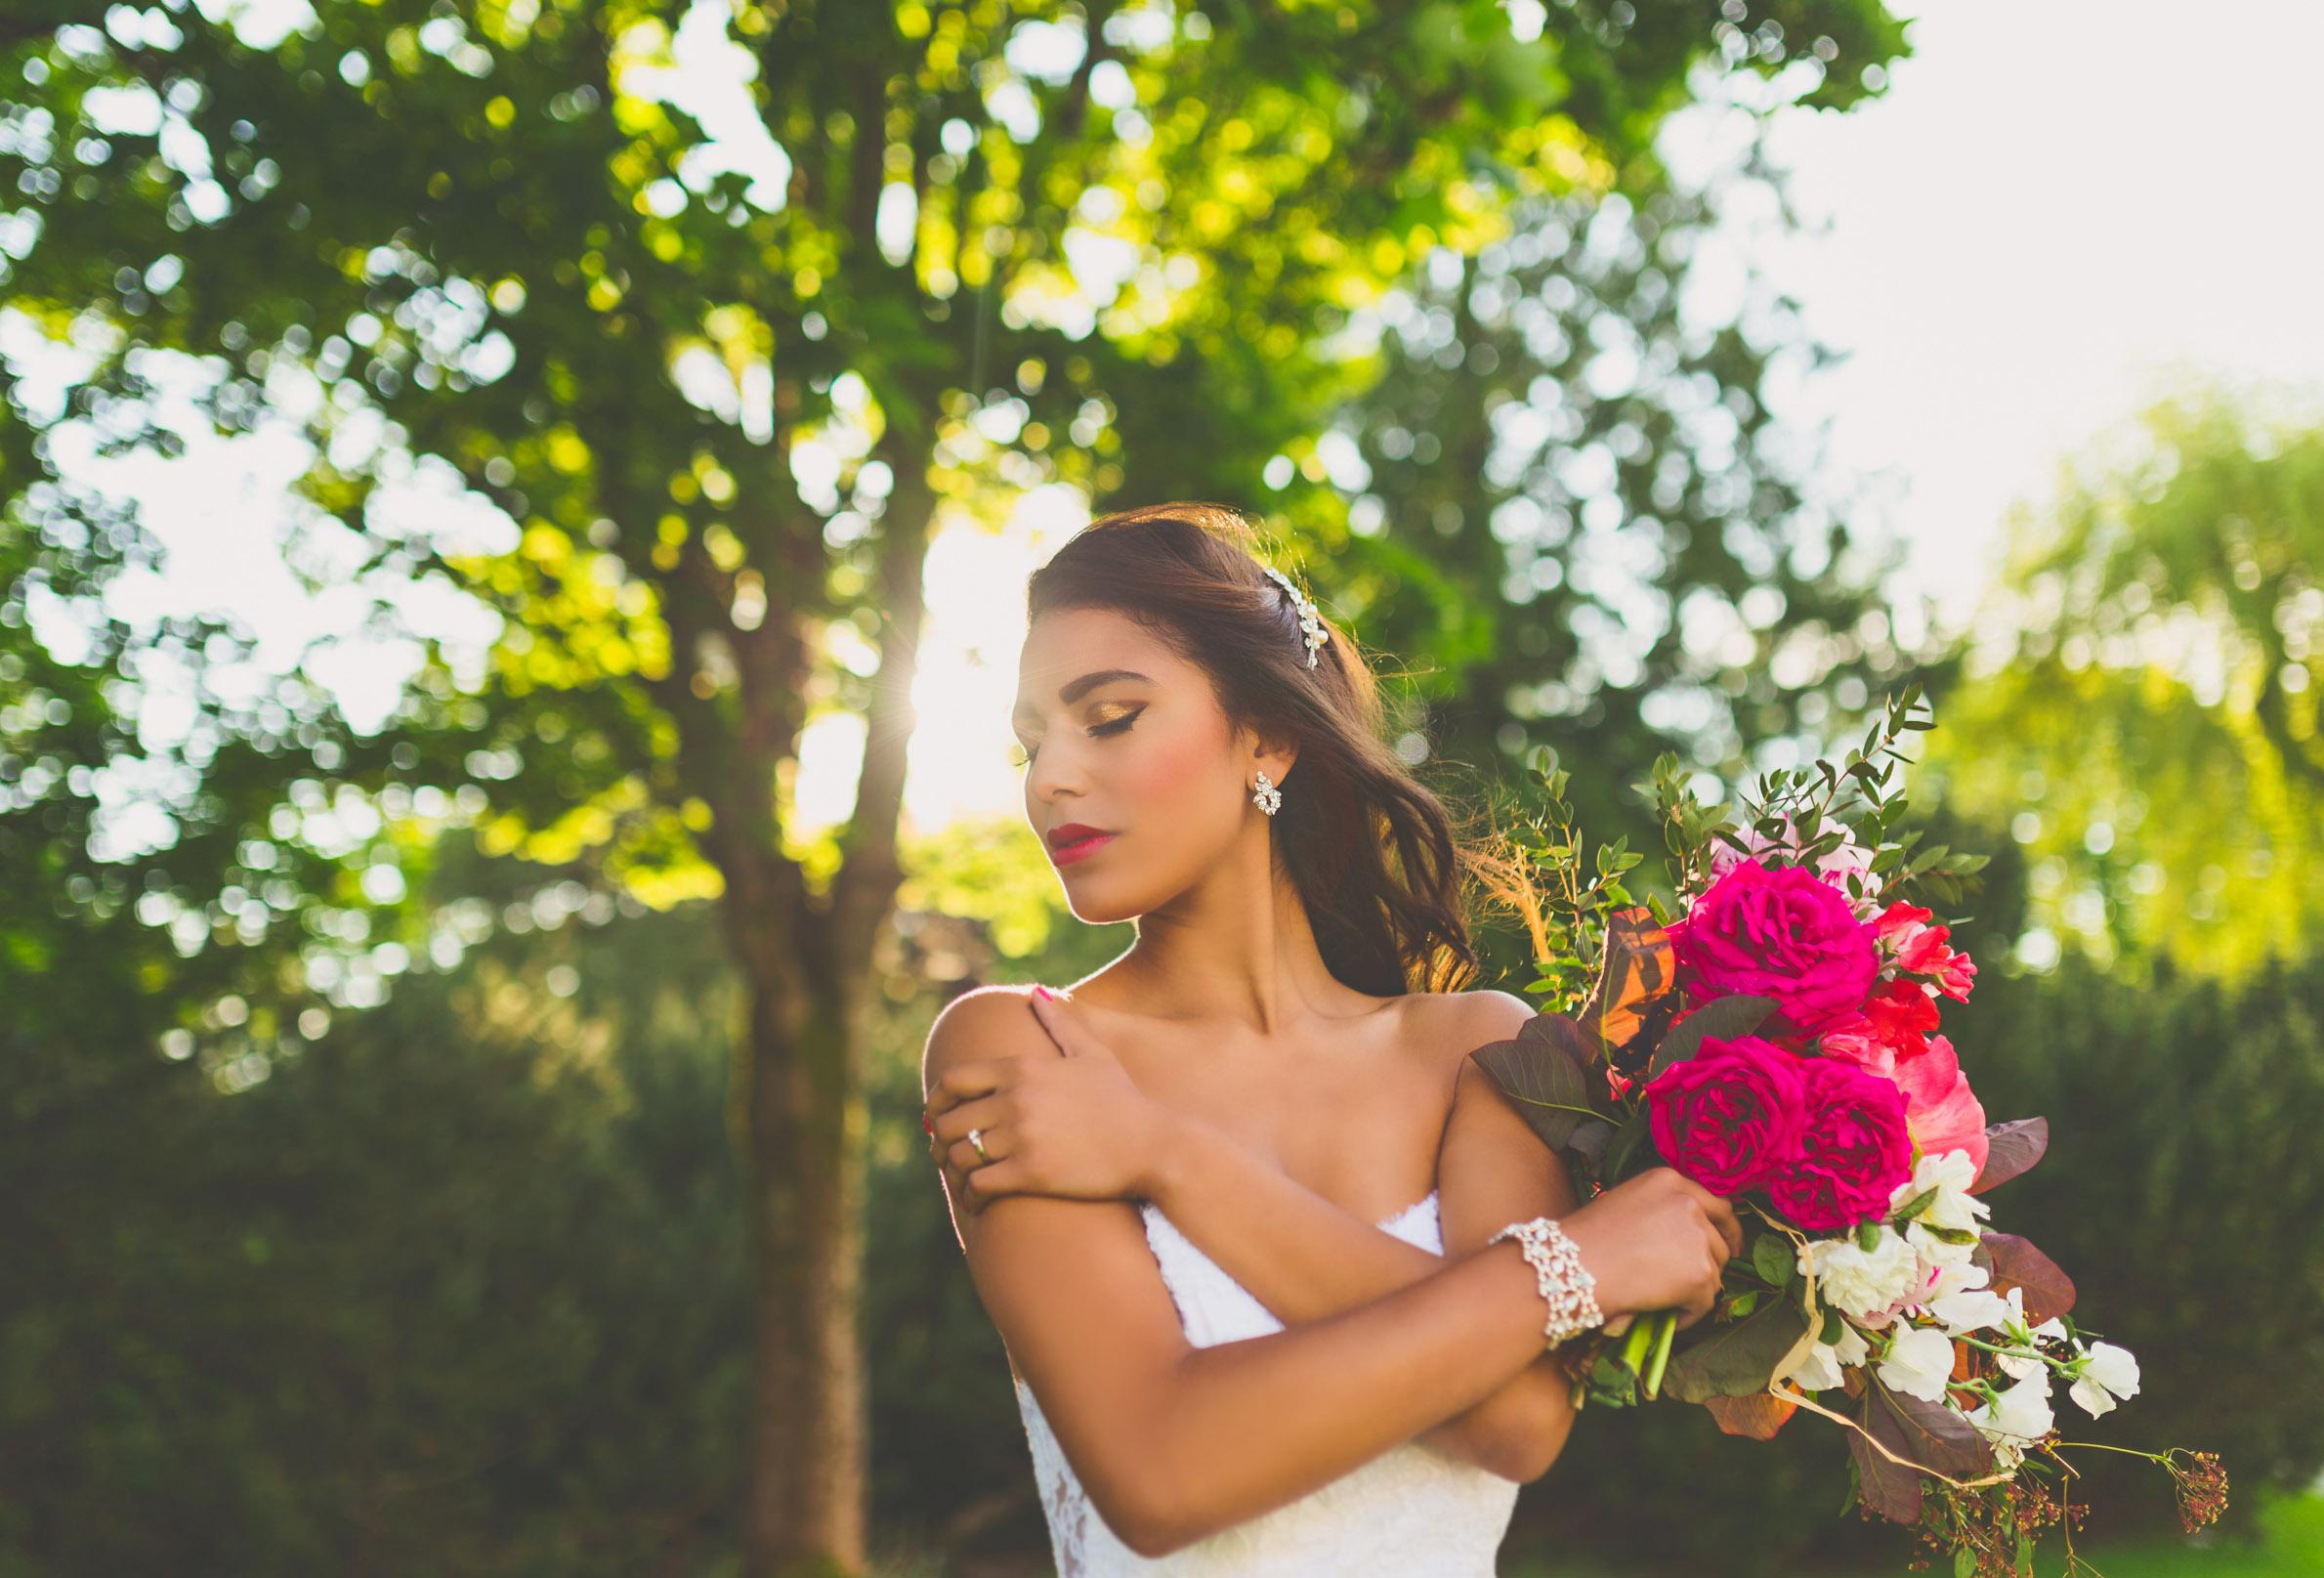 IMG_4323-BRIDAL-EDITORIAL-VANCOUVER-WEDDING-PHOTOGRAPHER-JENNIFER-PICARD-PHOTOGRAPHY.jpg